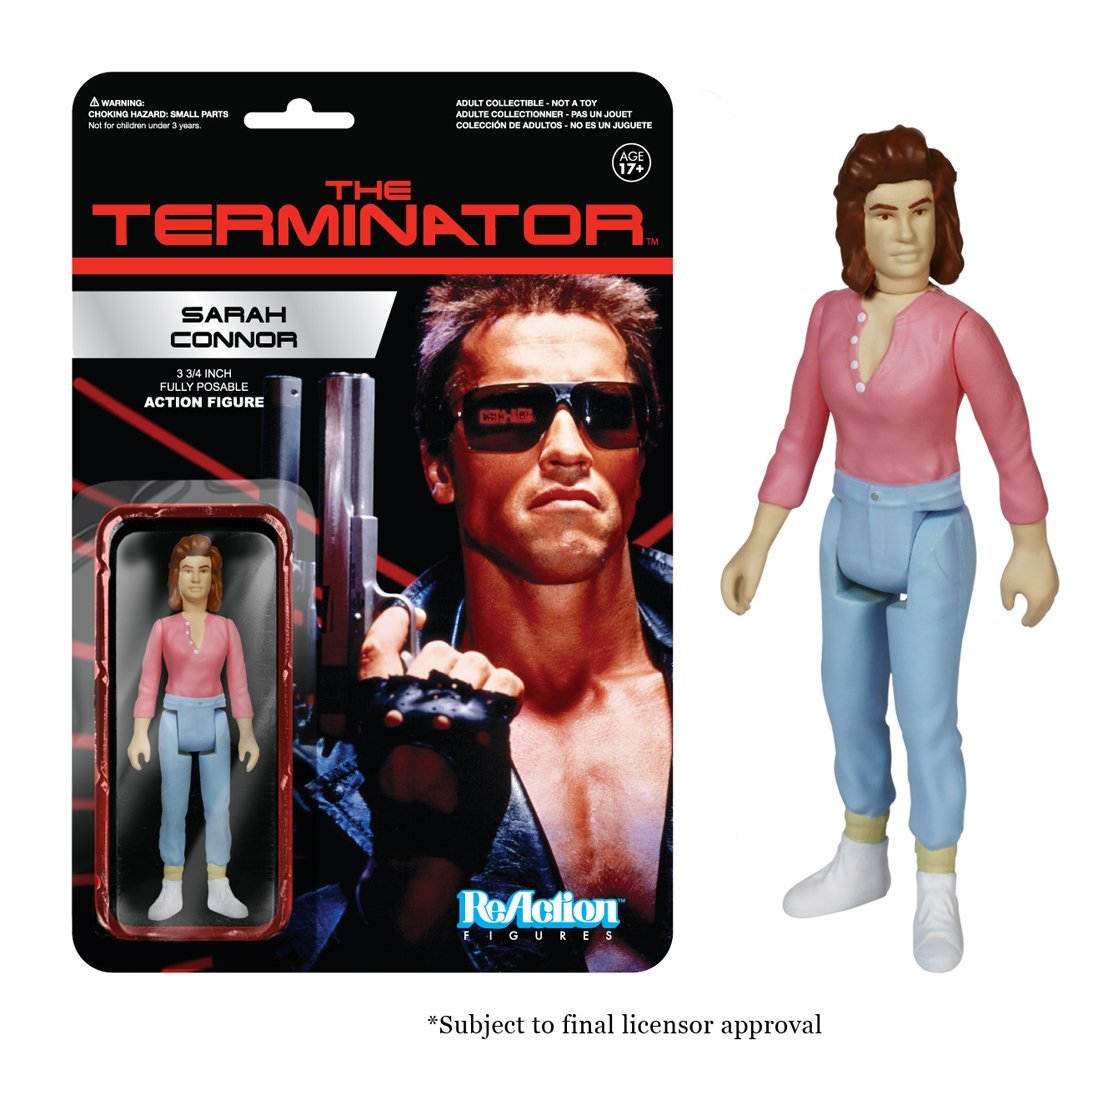 Funko <font><b>ReAction</b></font> <font><b>Figure</b></font> <font><b>The</b></font> <font><b>Terminator</b></font> - <font><b>Sarah</b></font> <font><b>Connor</b></font> Vinyl <font><b>Action</b></font> <font><b>Figure</b></font> Collectible Model Toy with Original Box